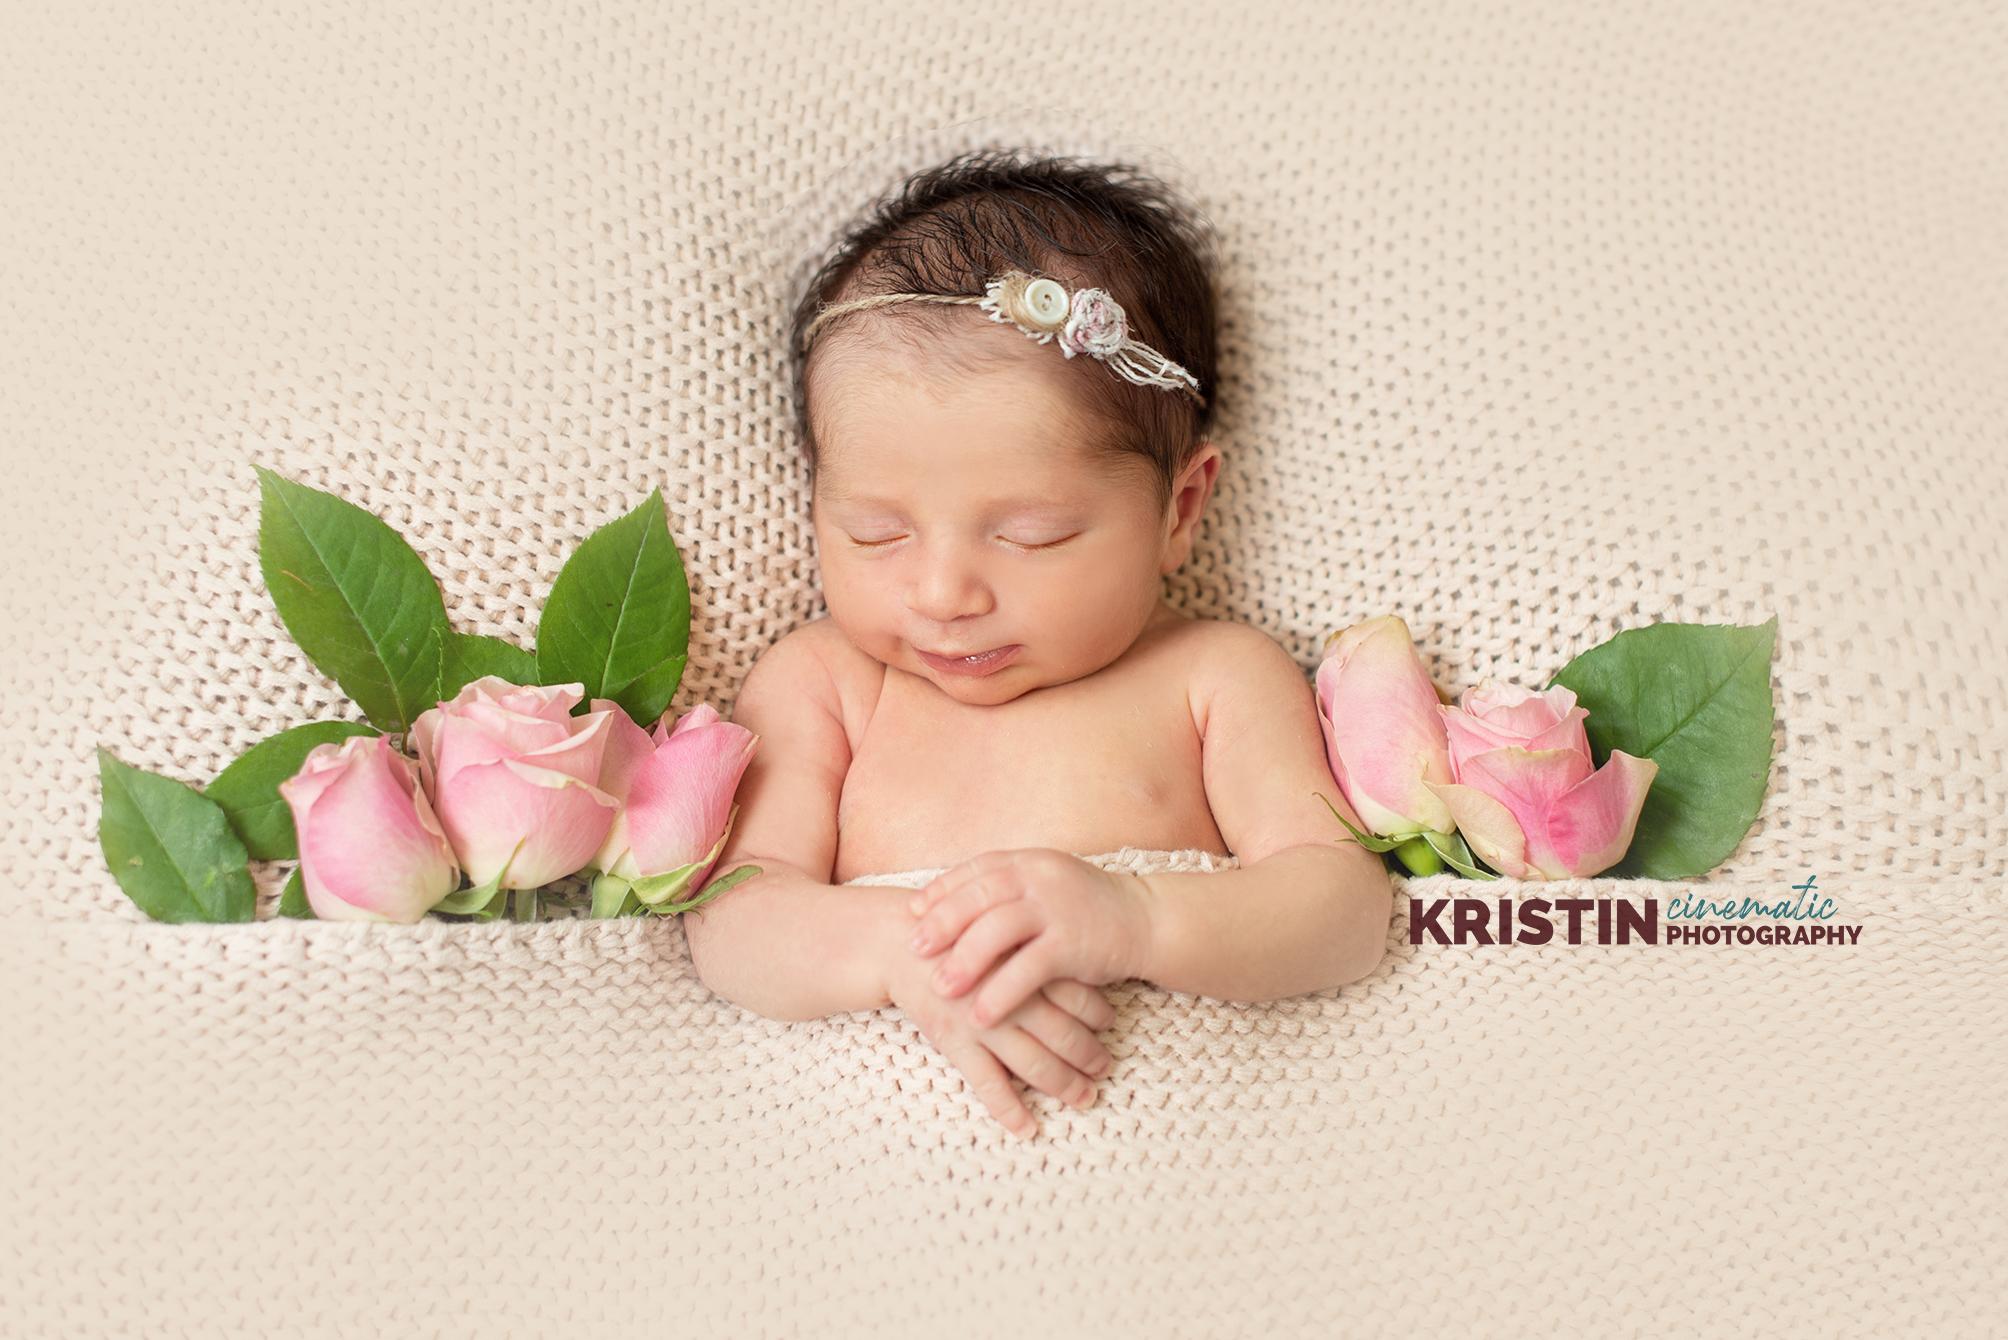 Fotograf i Eskilstuna Kristin - Photography-1BAcop.jpg